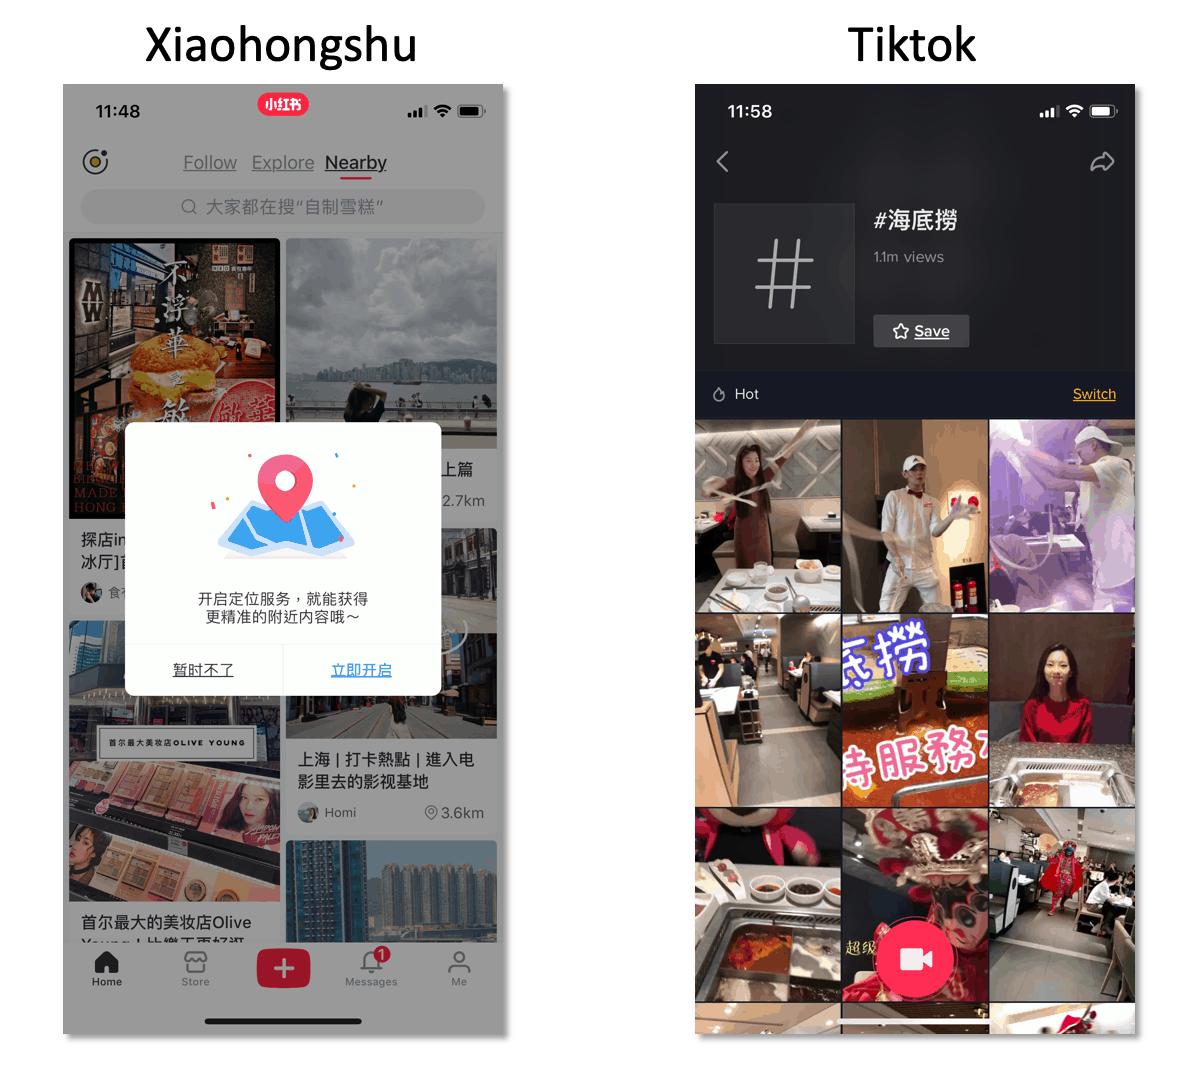 Xiahongshu和TikTok都提供地理位置标签,以在本地范围内传播您的内容